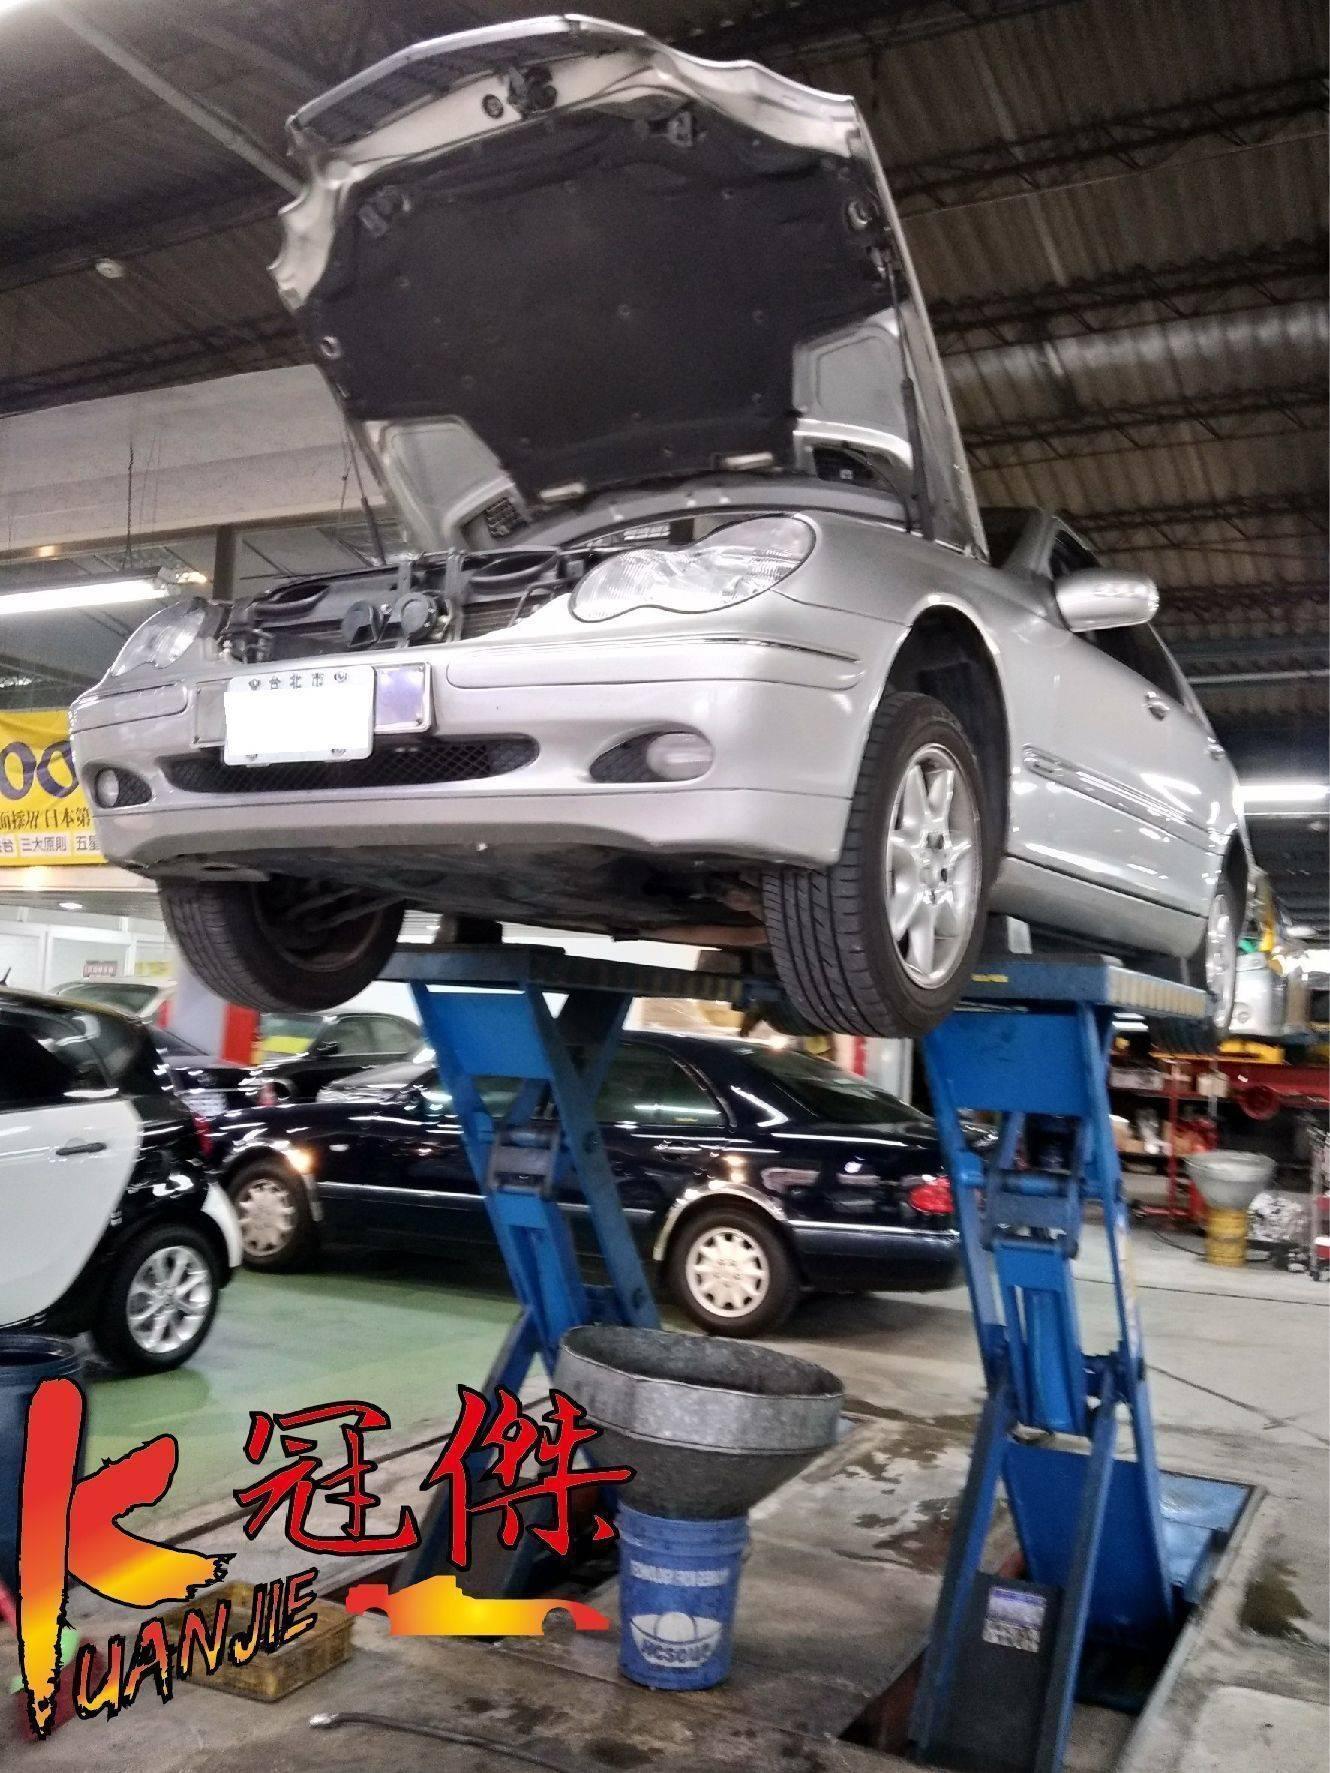 【K J 冠傑汽車】賓士/BENZ 722.6變速箱鎖檔故障問題